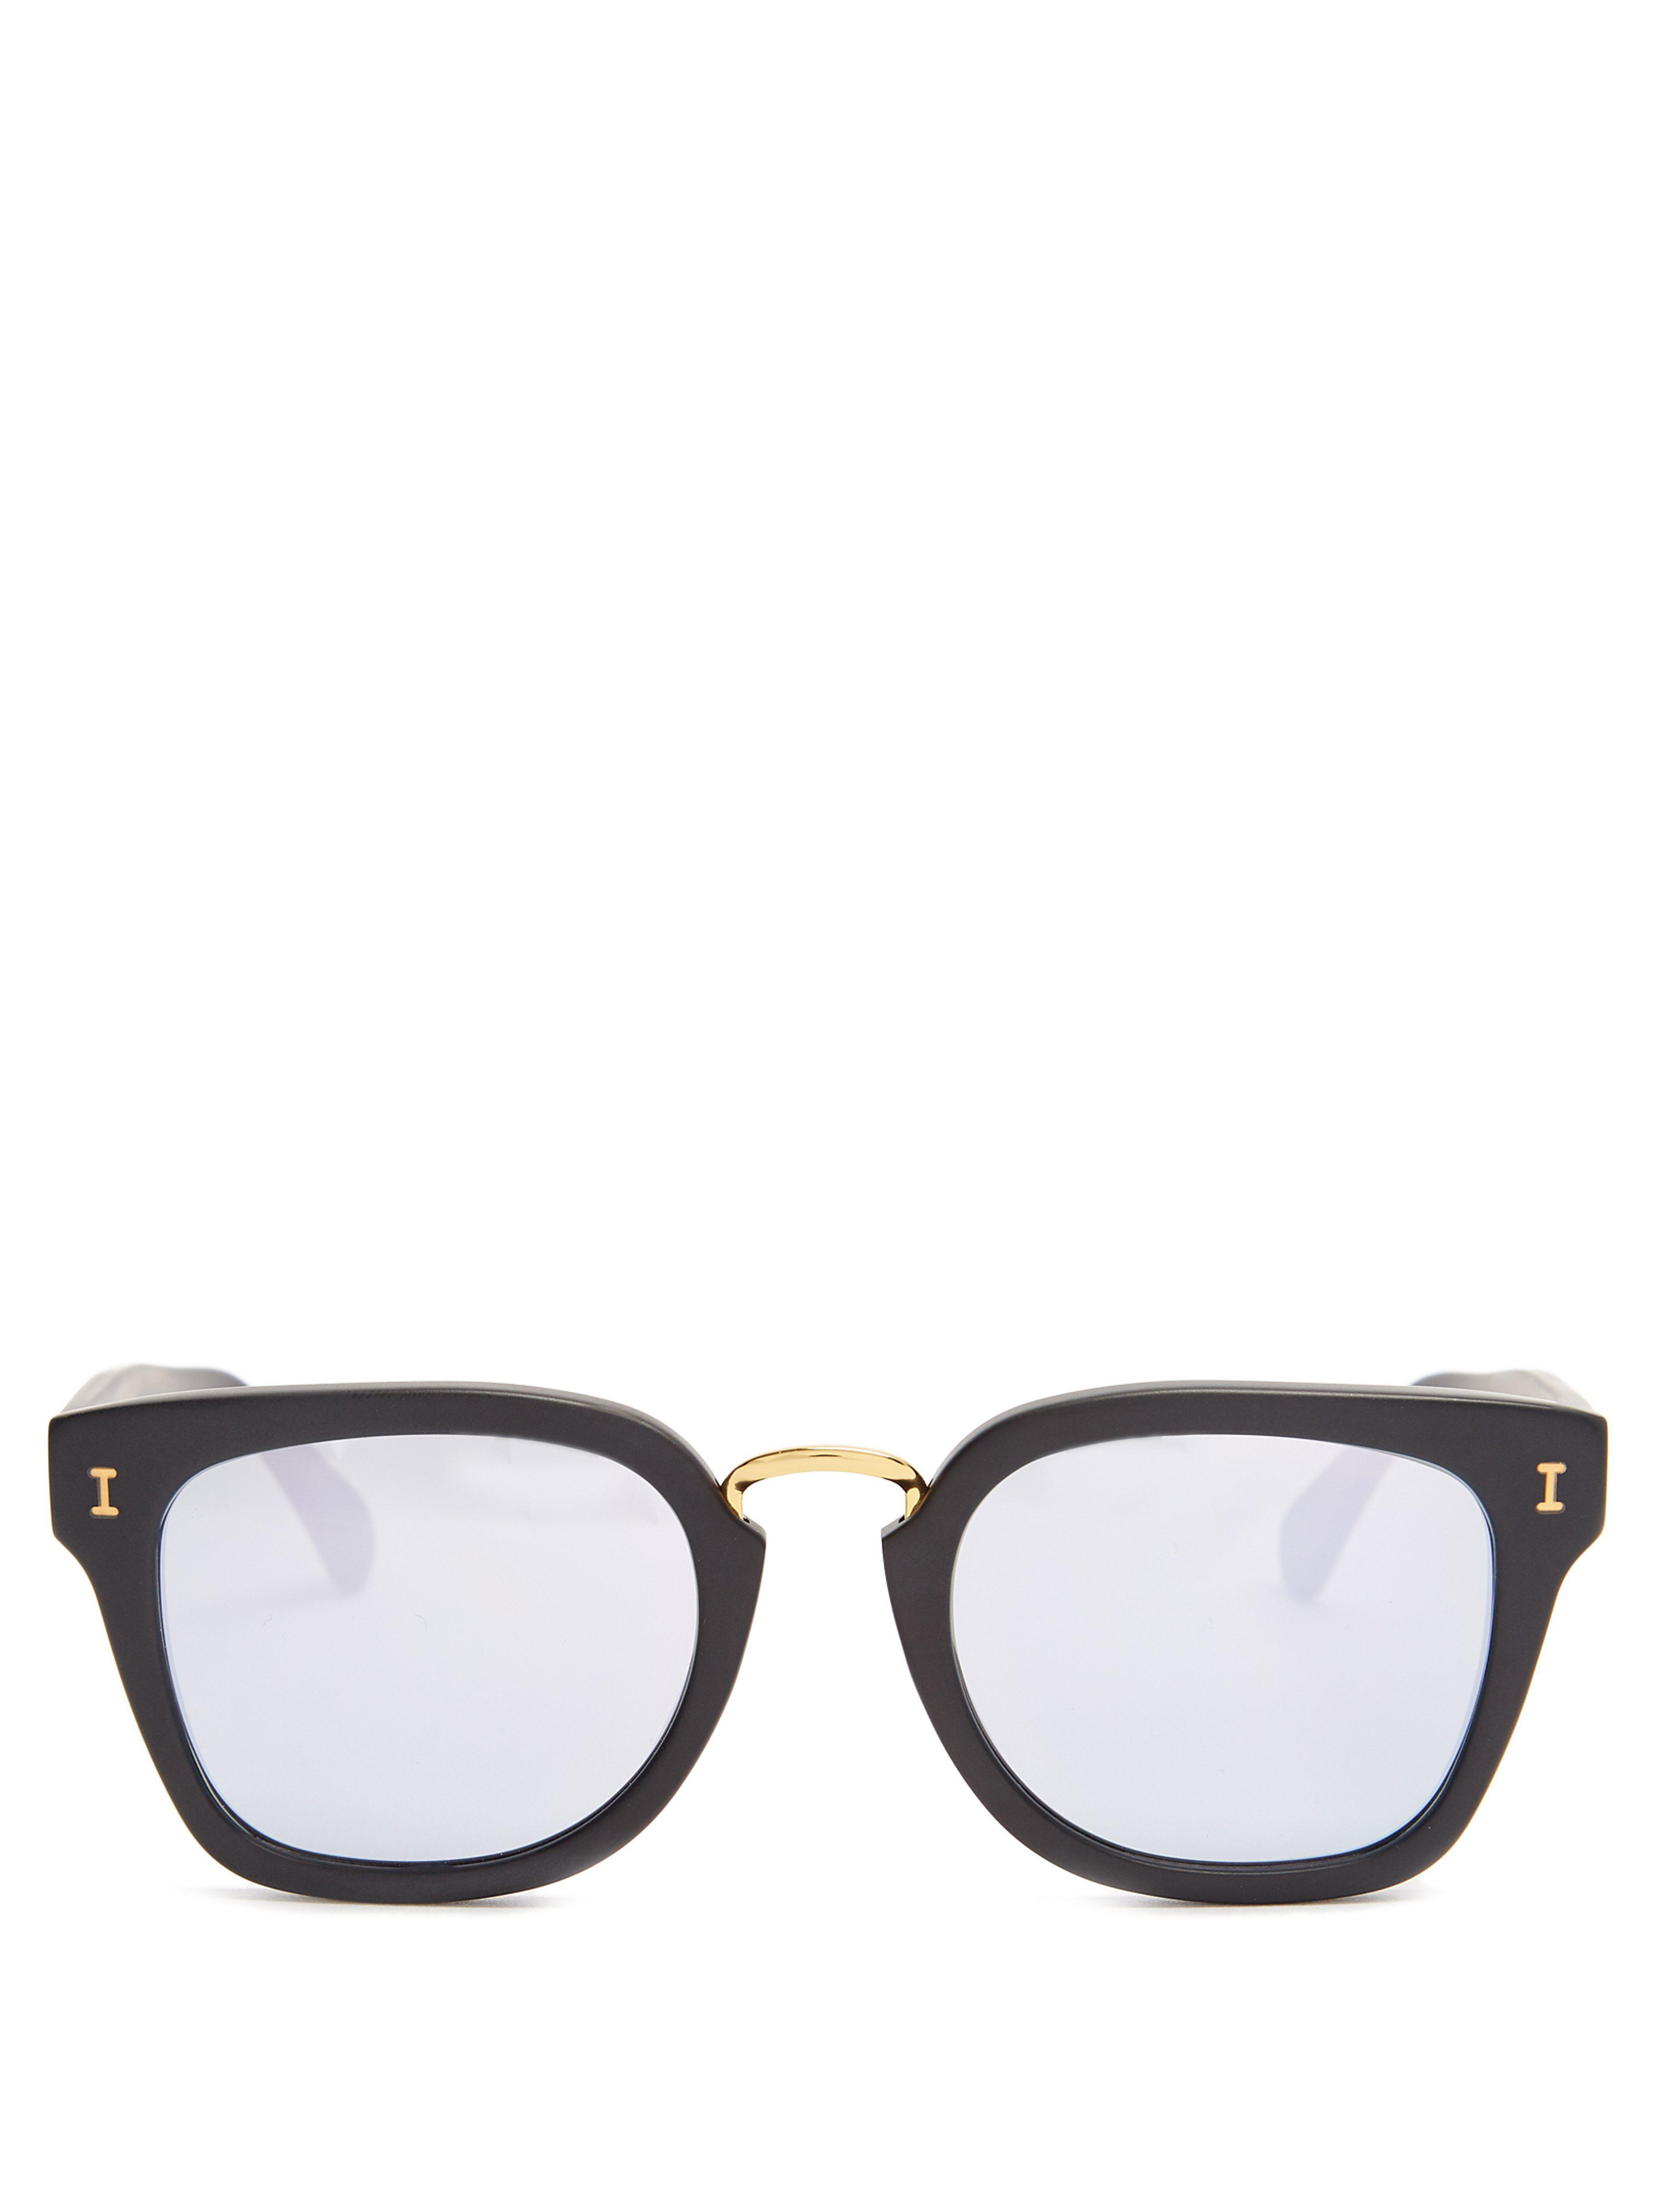 8a6e8eae03 Illesteva Positano Rounded Square Acetate Sunglasses in Black for ...